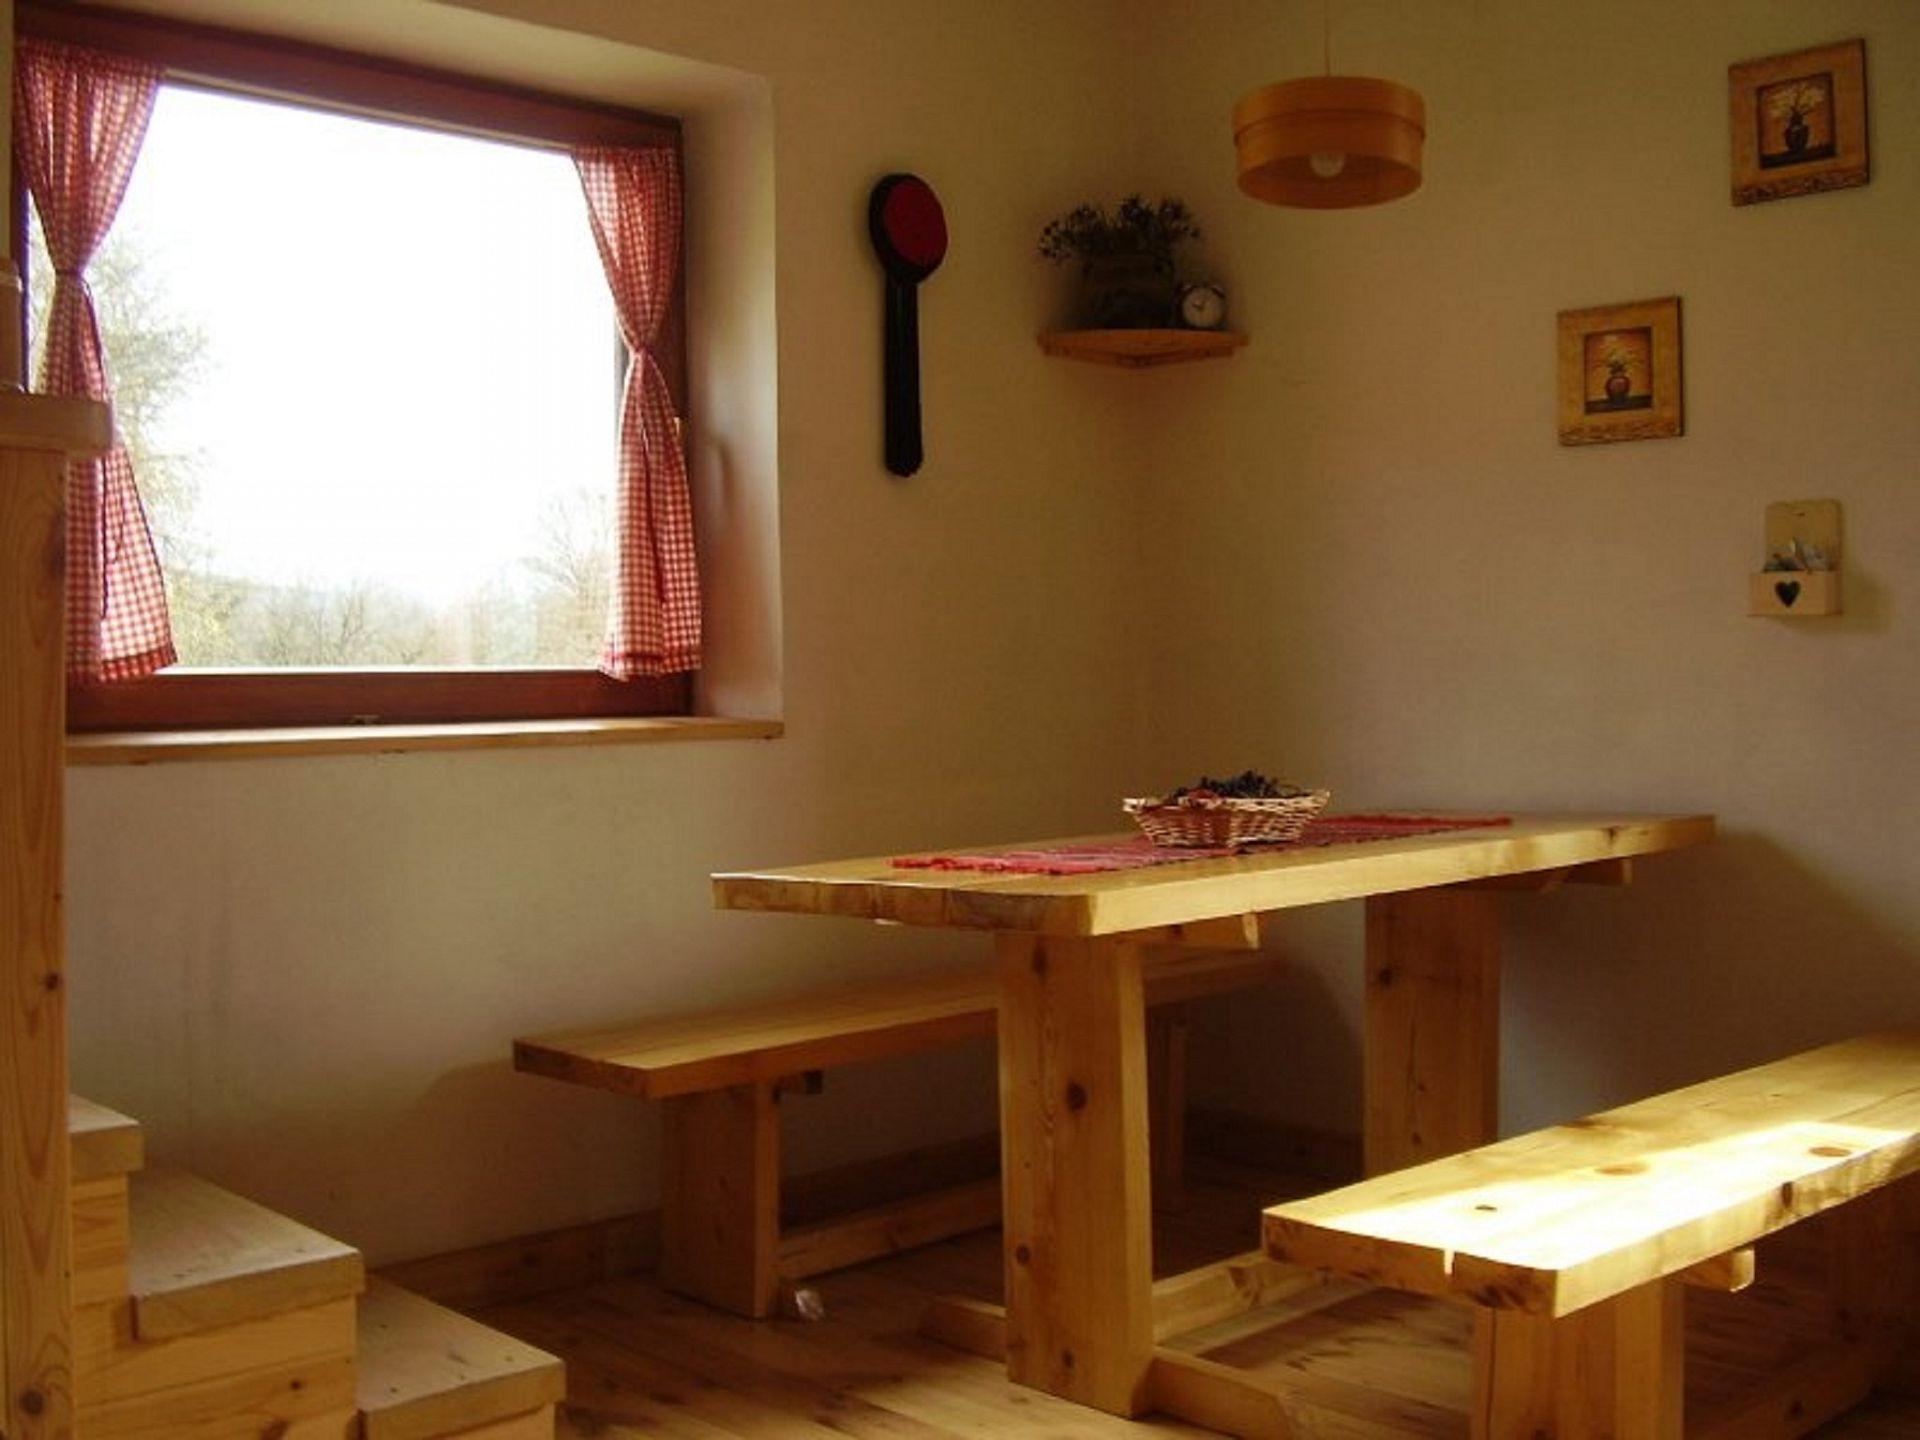 Biserka - Gacka dolina - Maisons de repos, villas Croatie - H(4+2): intérieur